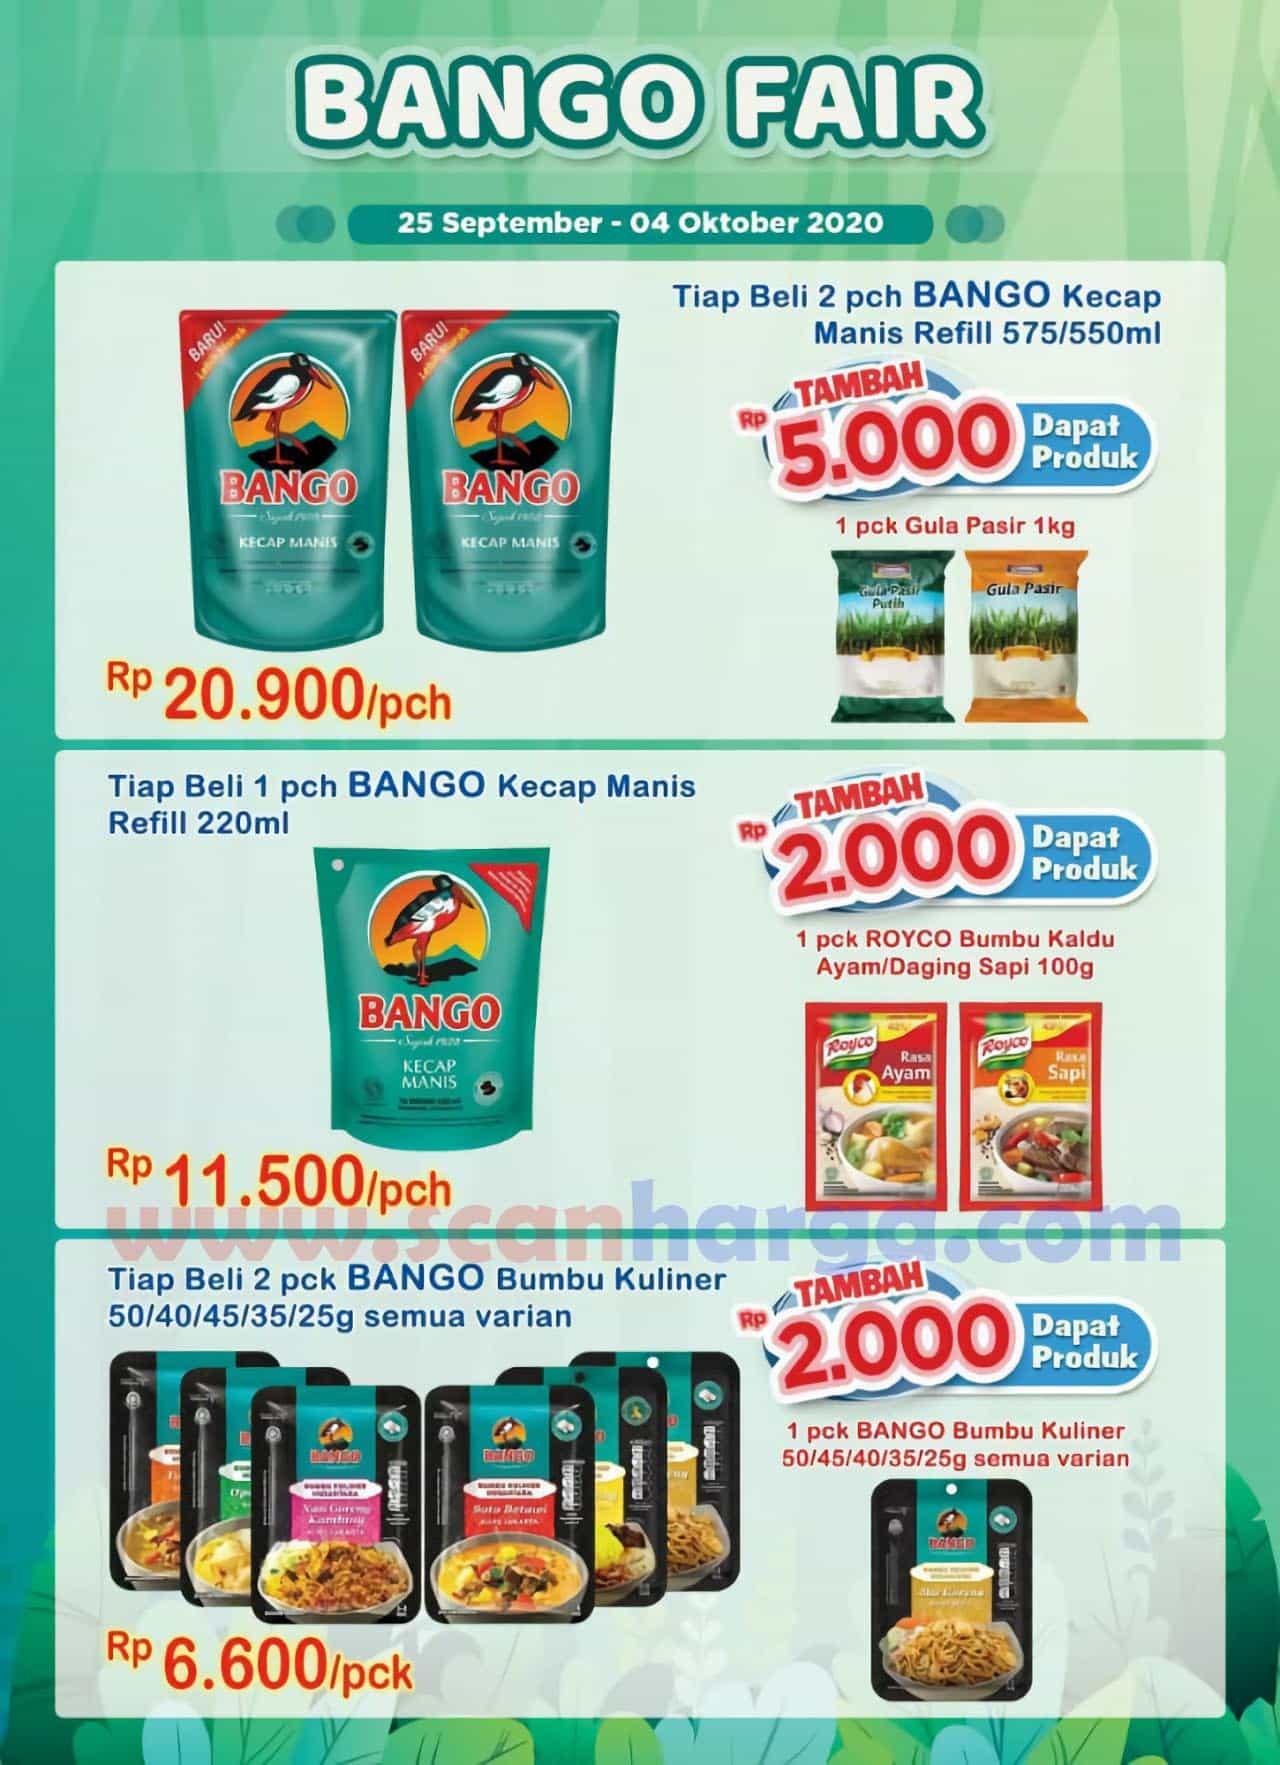 Promo Indomaret Bango Fair Periode 25 September 4 Oktober 2020 Scanharga